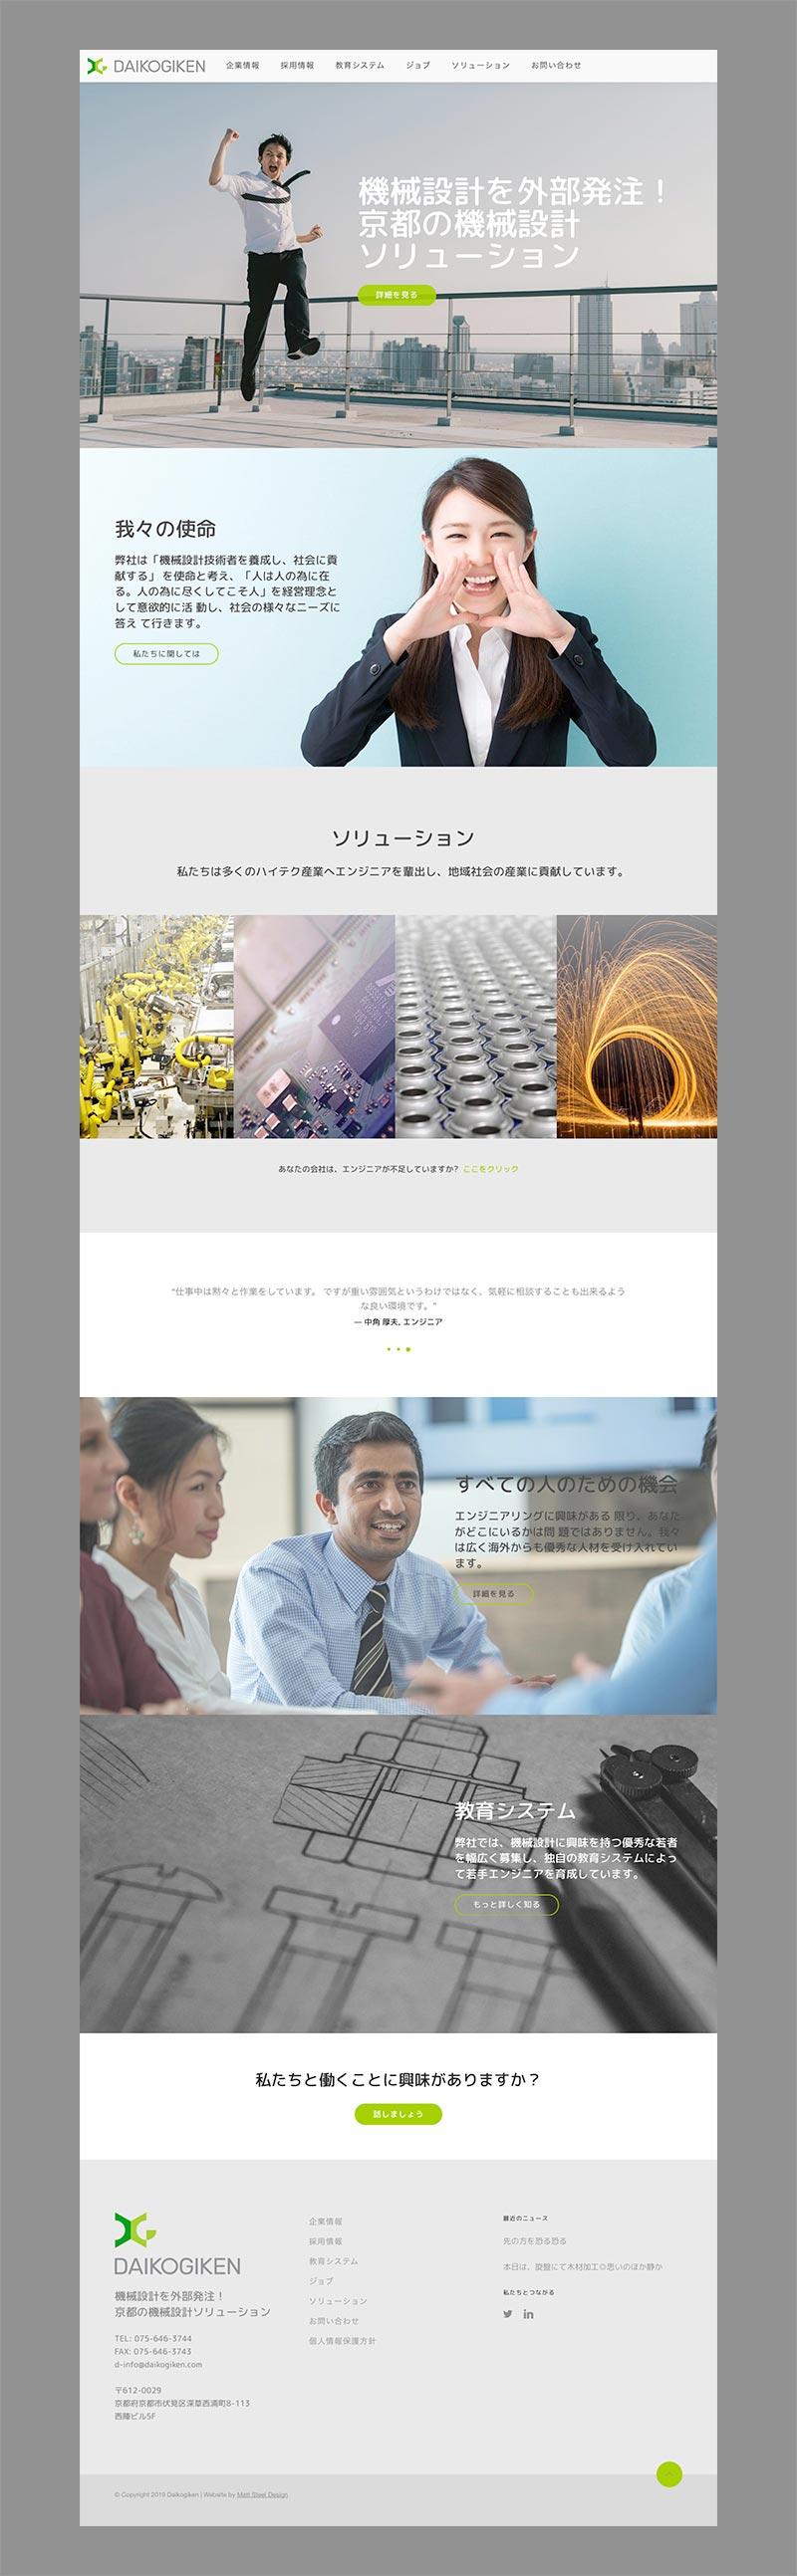 daikogiken website wordpress design